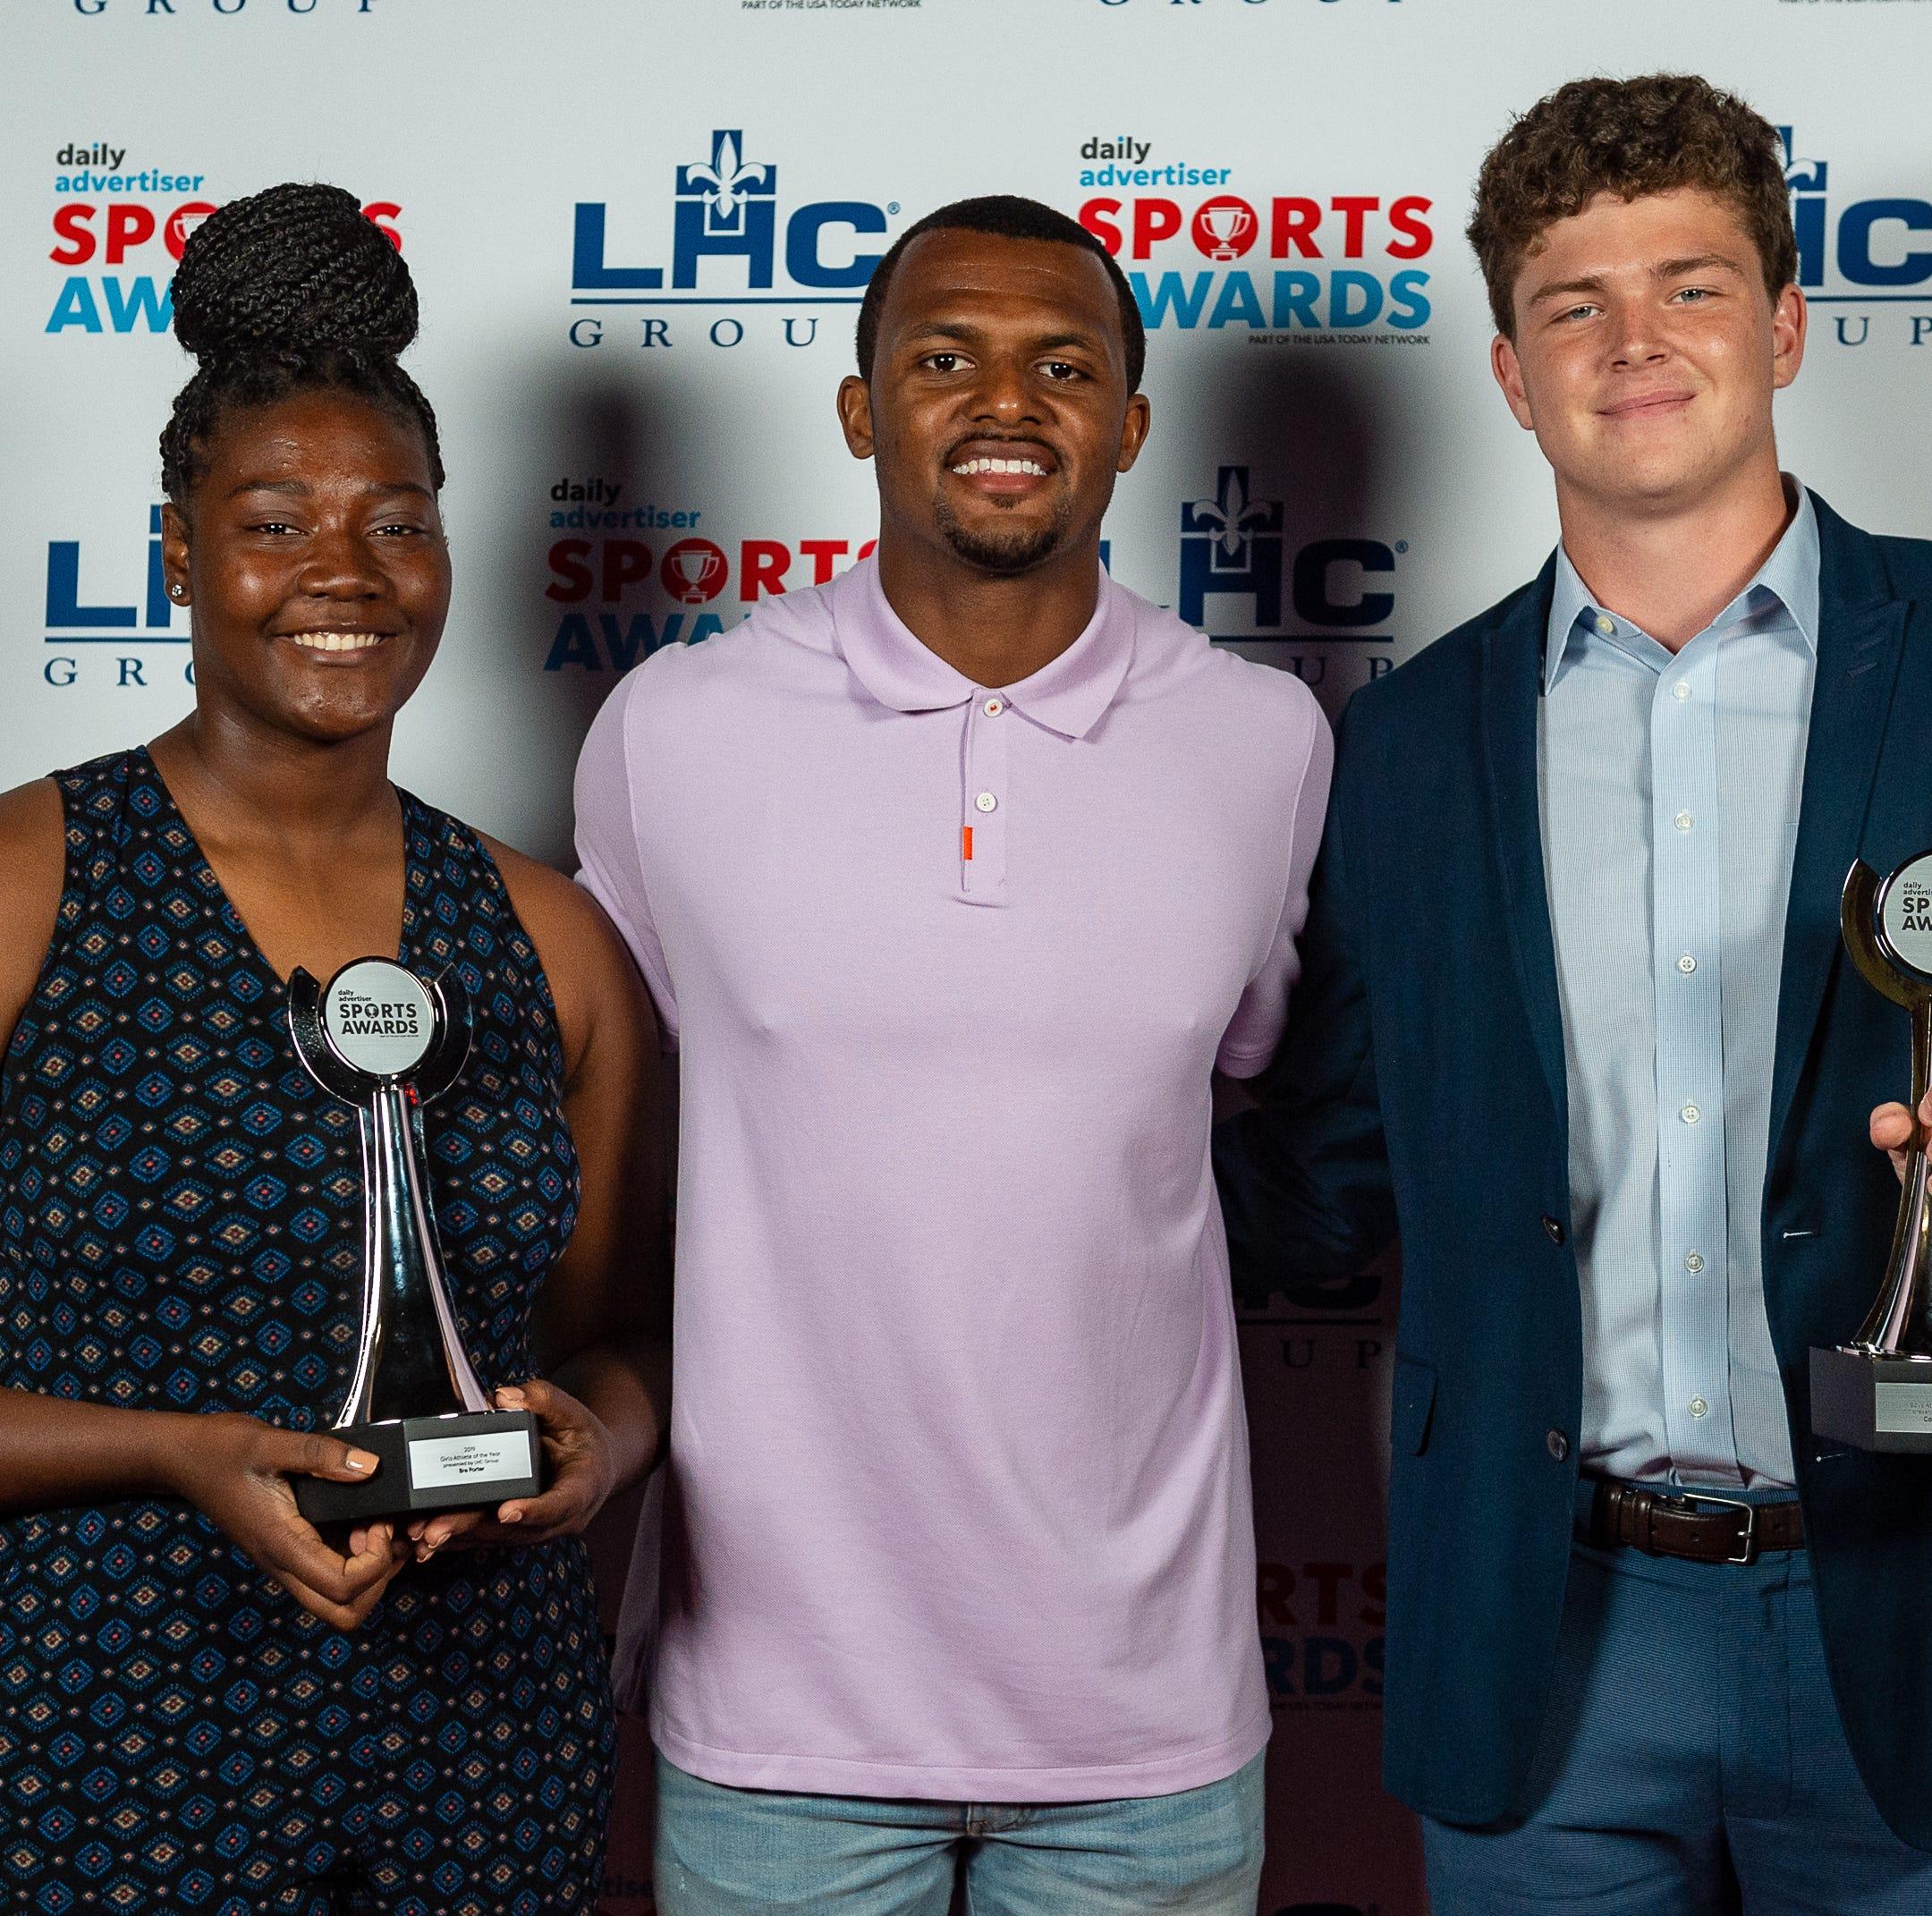 Daily Advertiser Sports Awards celebrates area's best high school athletes